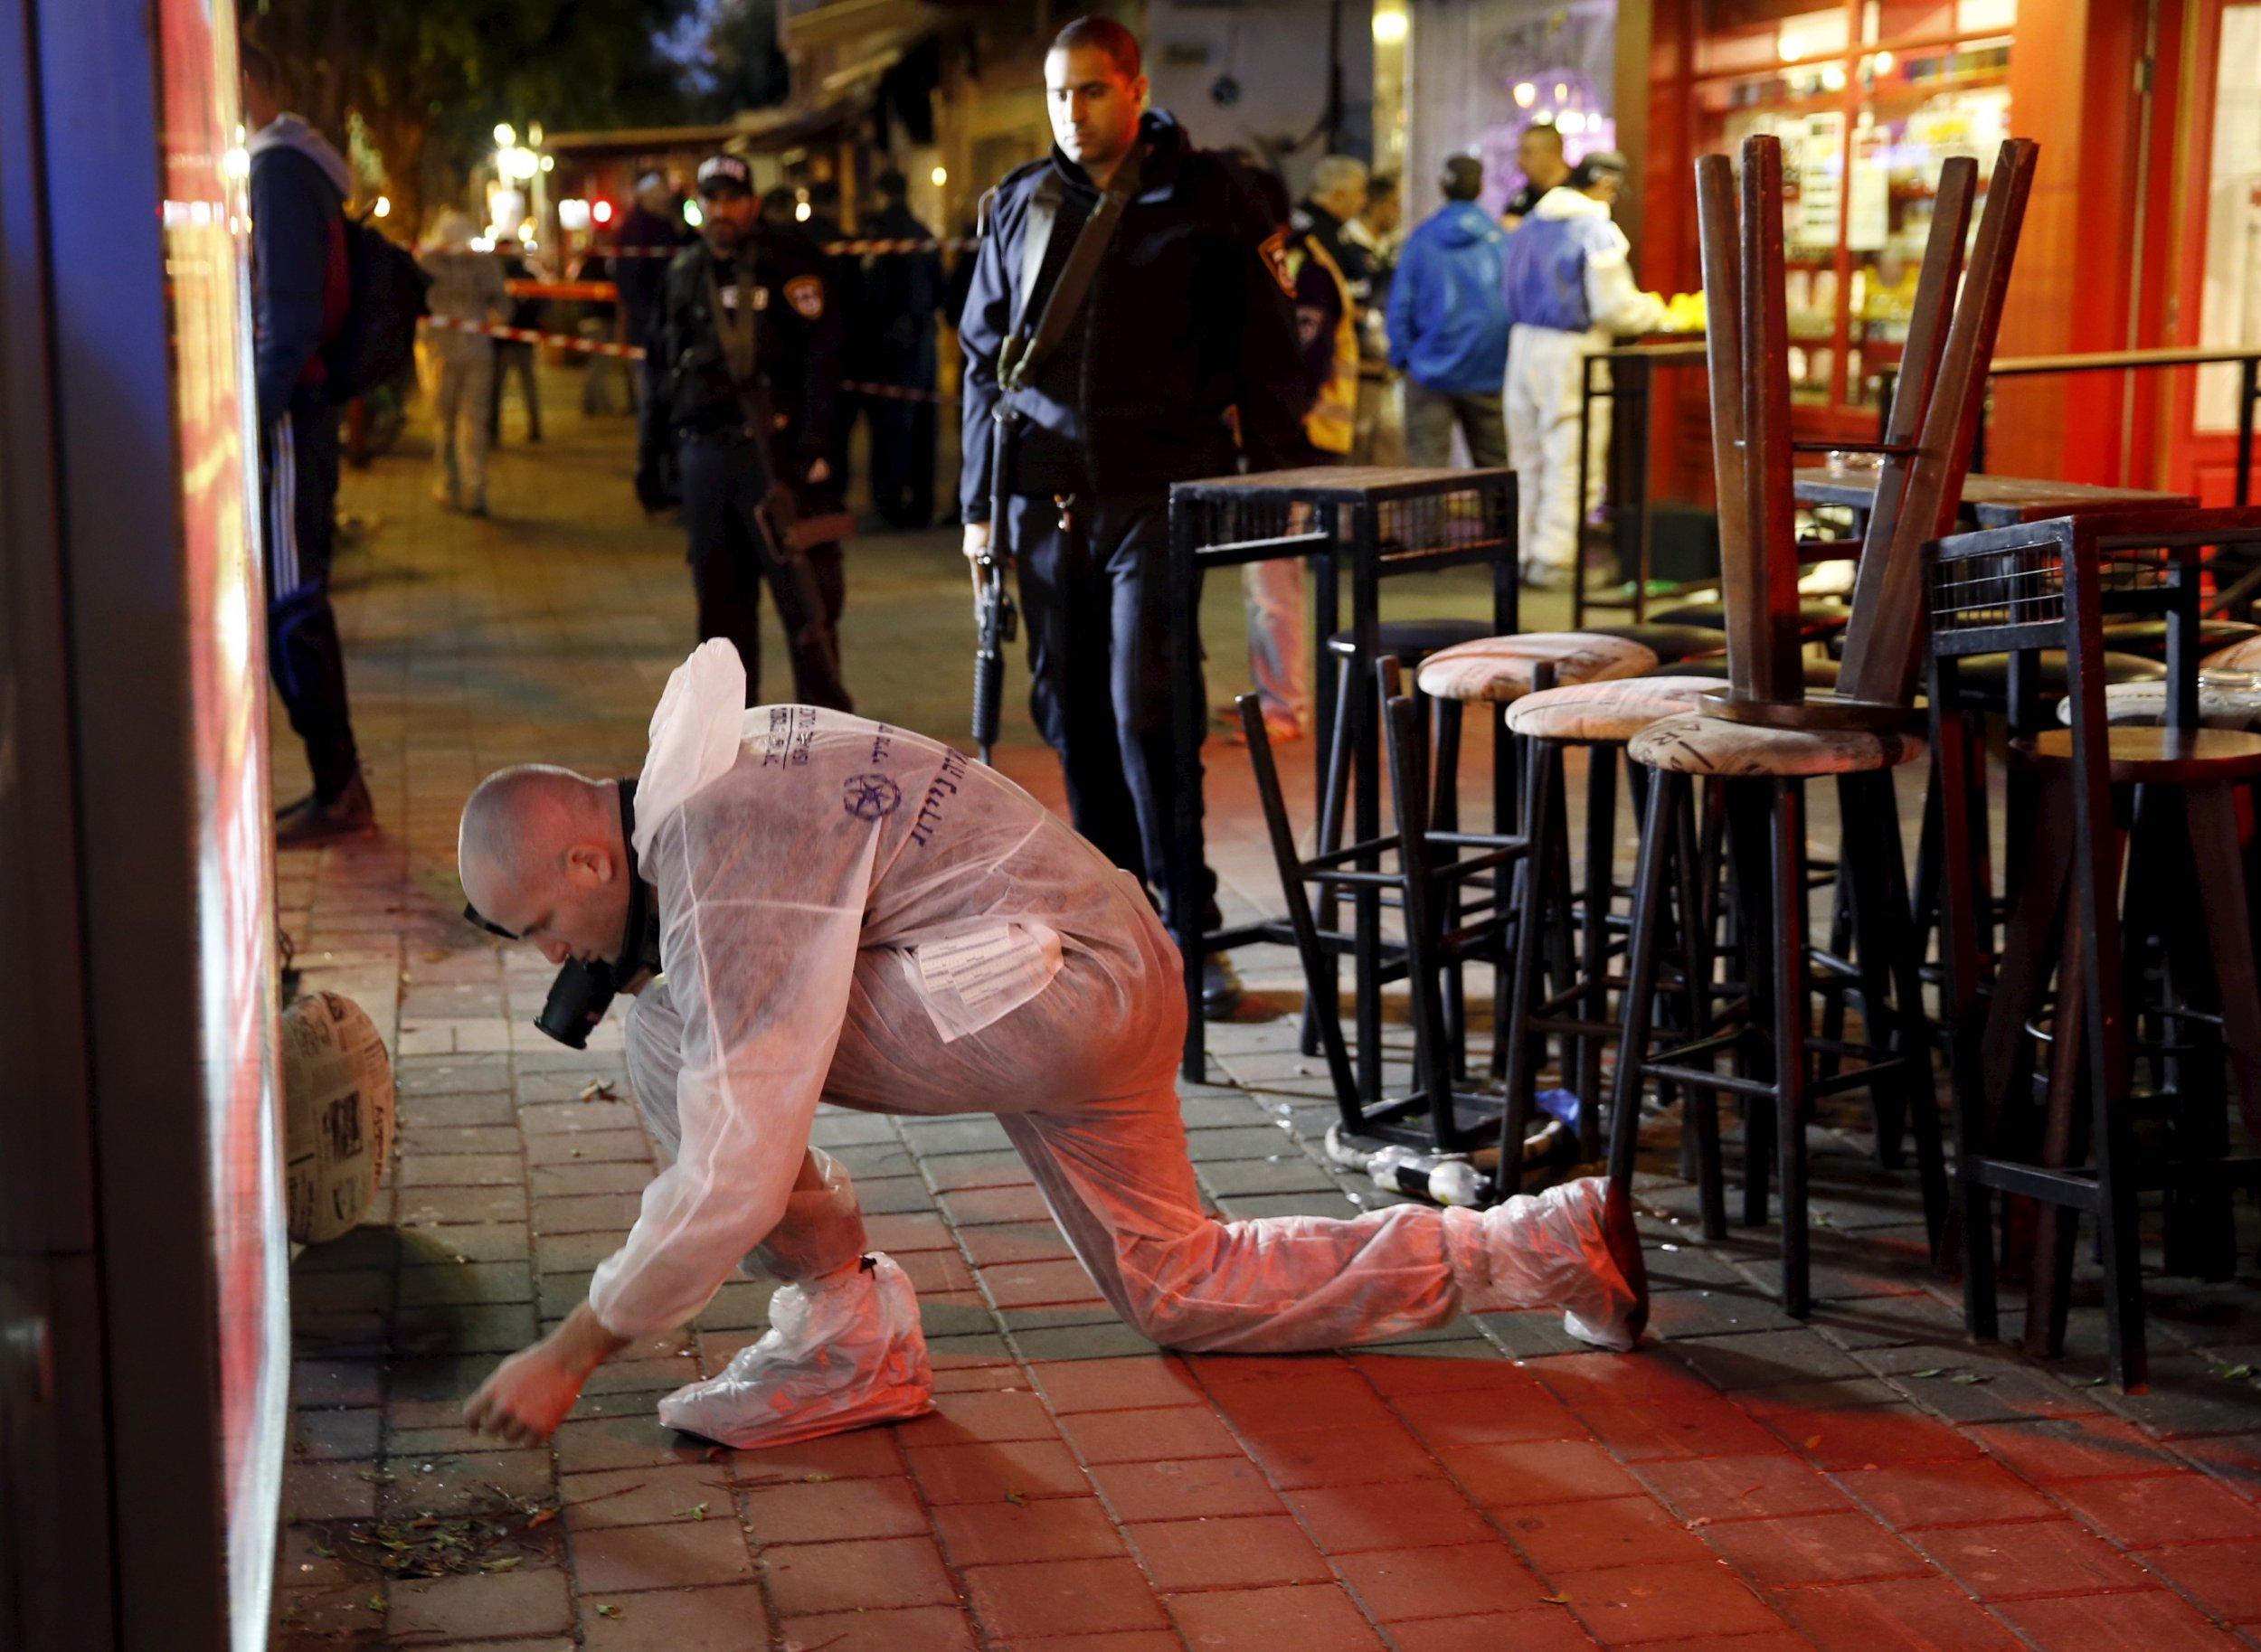 0108_Israel_TelAviv_Shooter_01